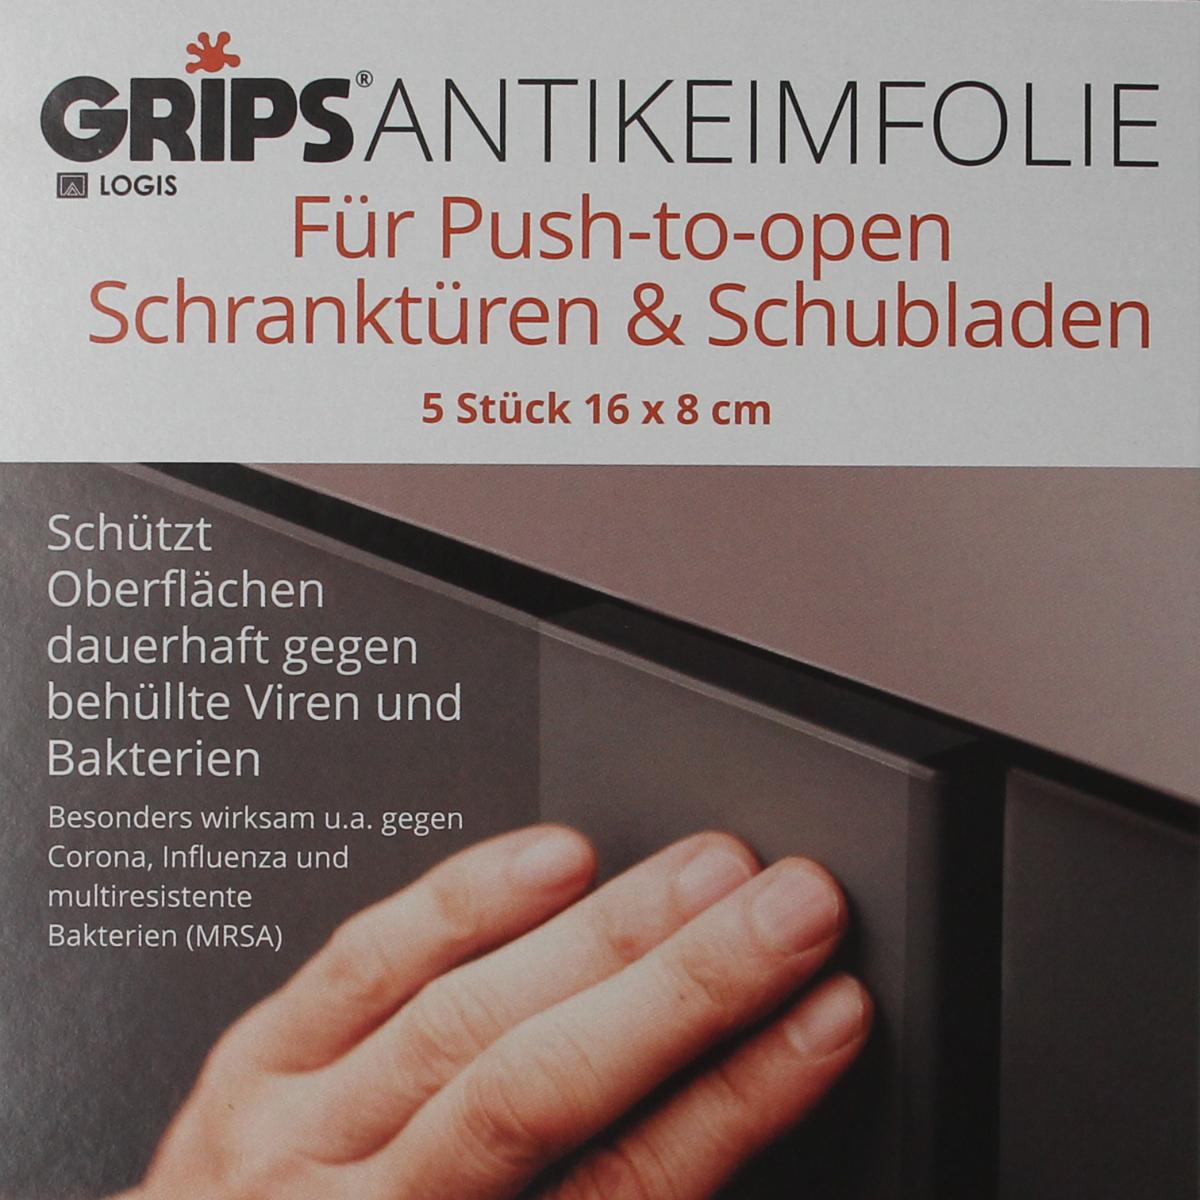 logis-grips-antikeimfolie-push-to-open